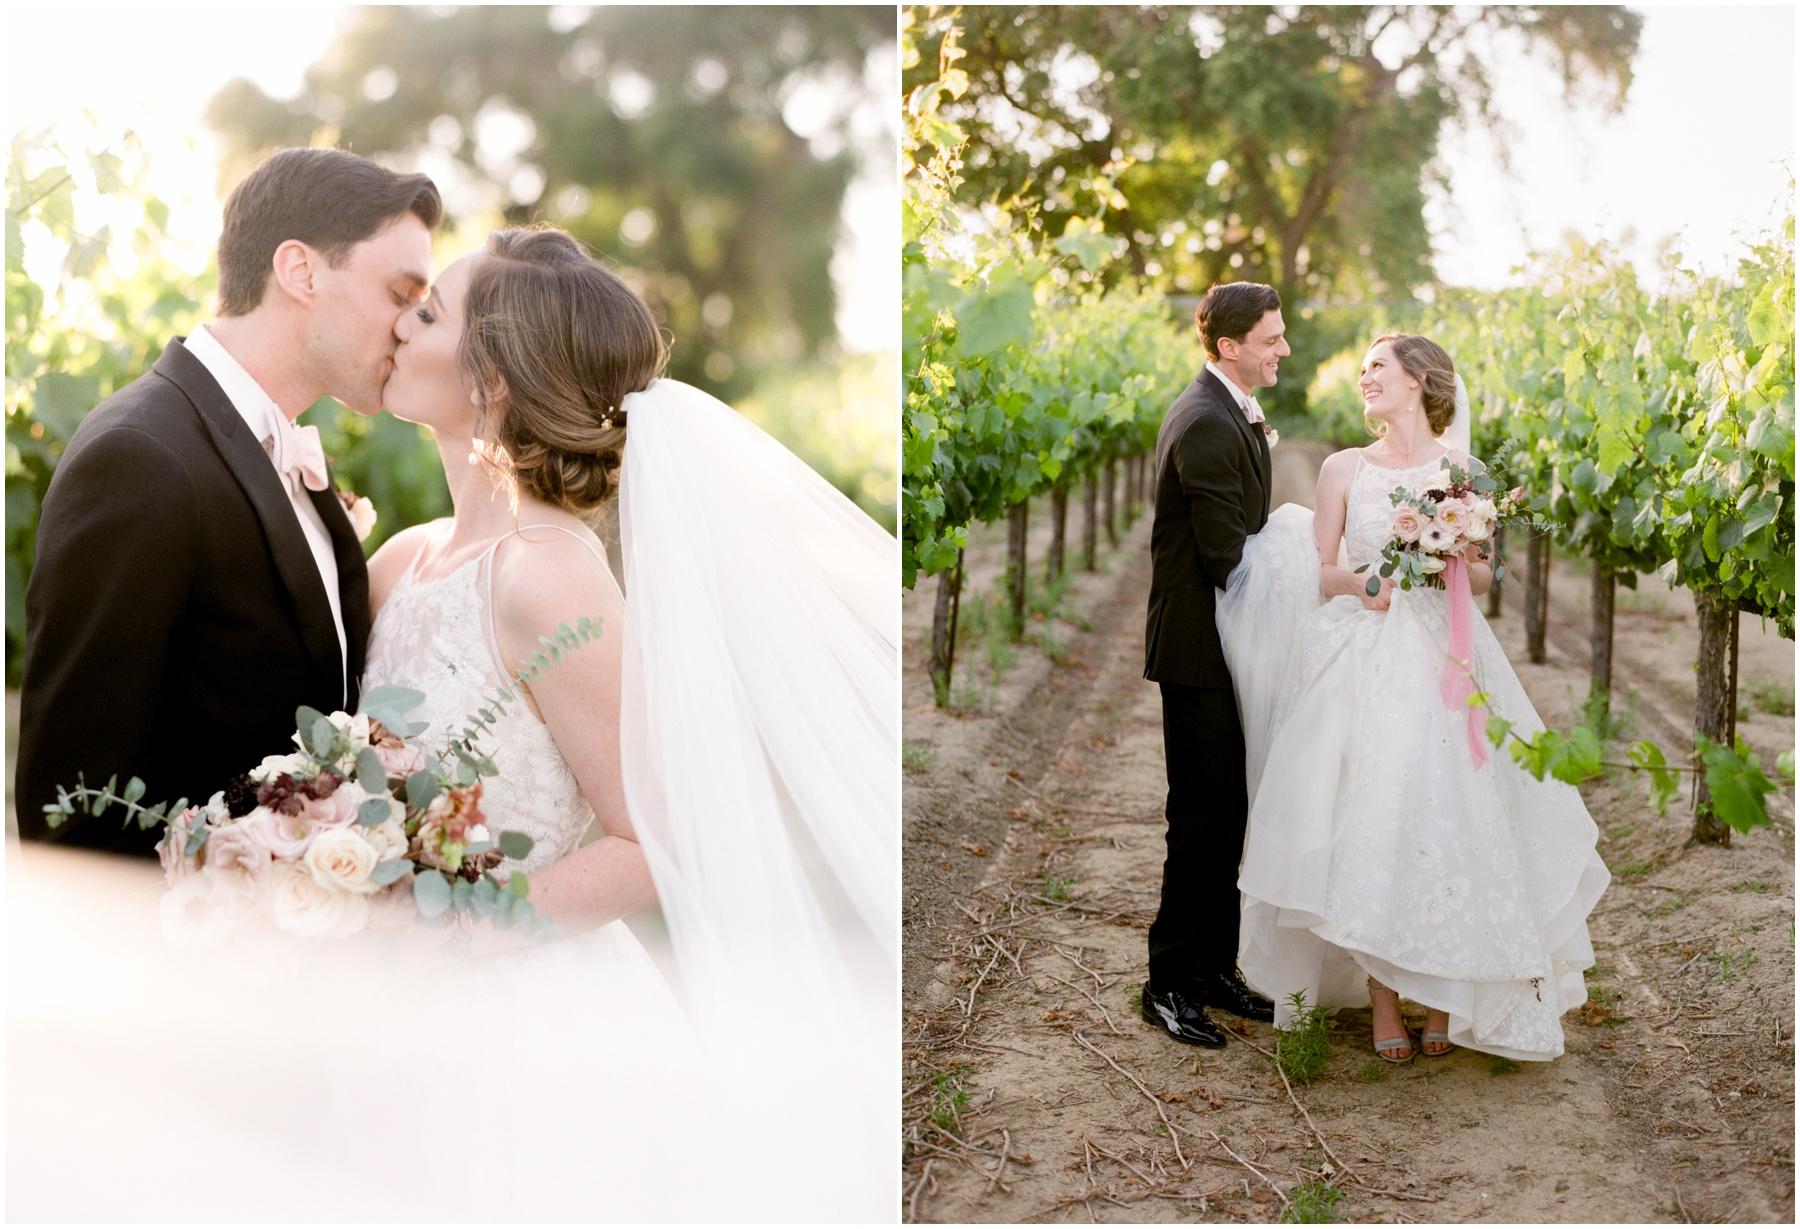 Scribner-bend-vineyards-wedding-sacramento-california-Kristine-Herman-Photography-48.jpg